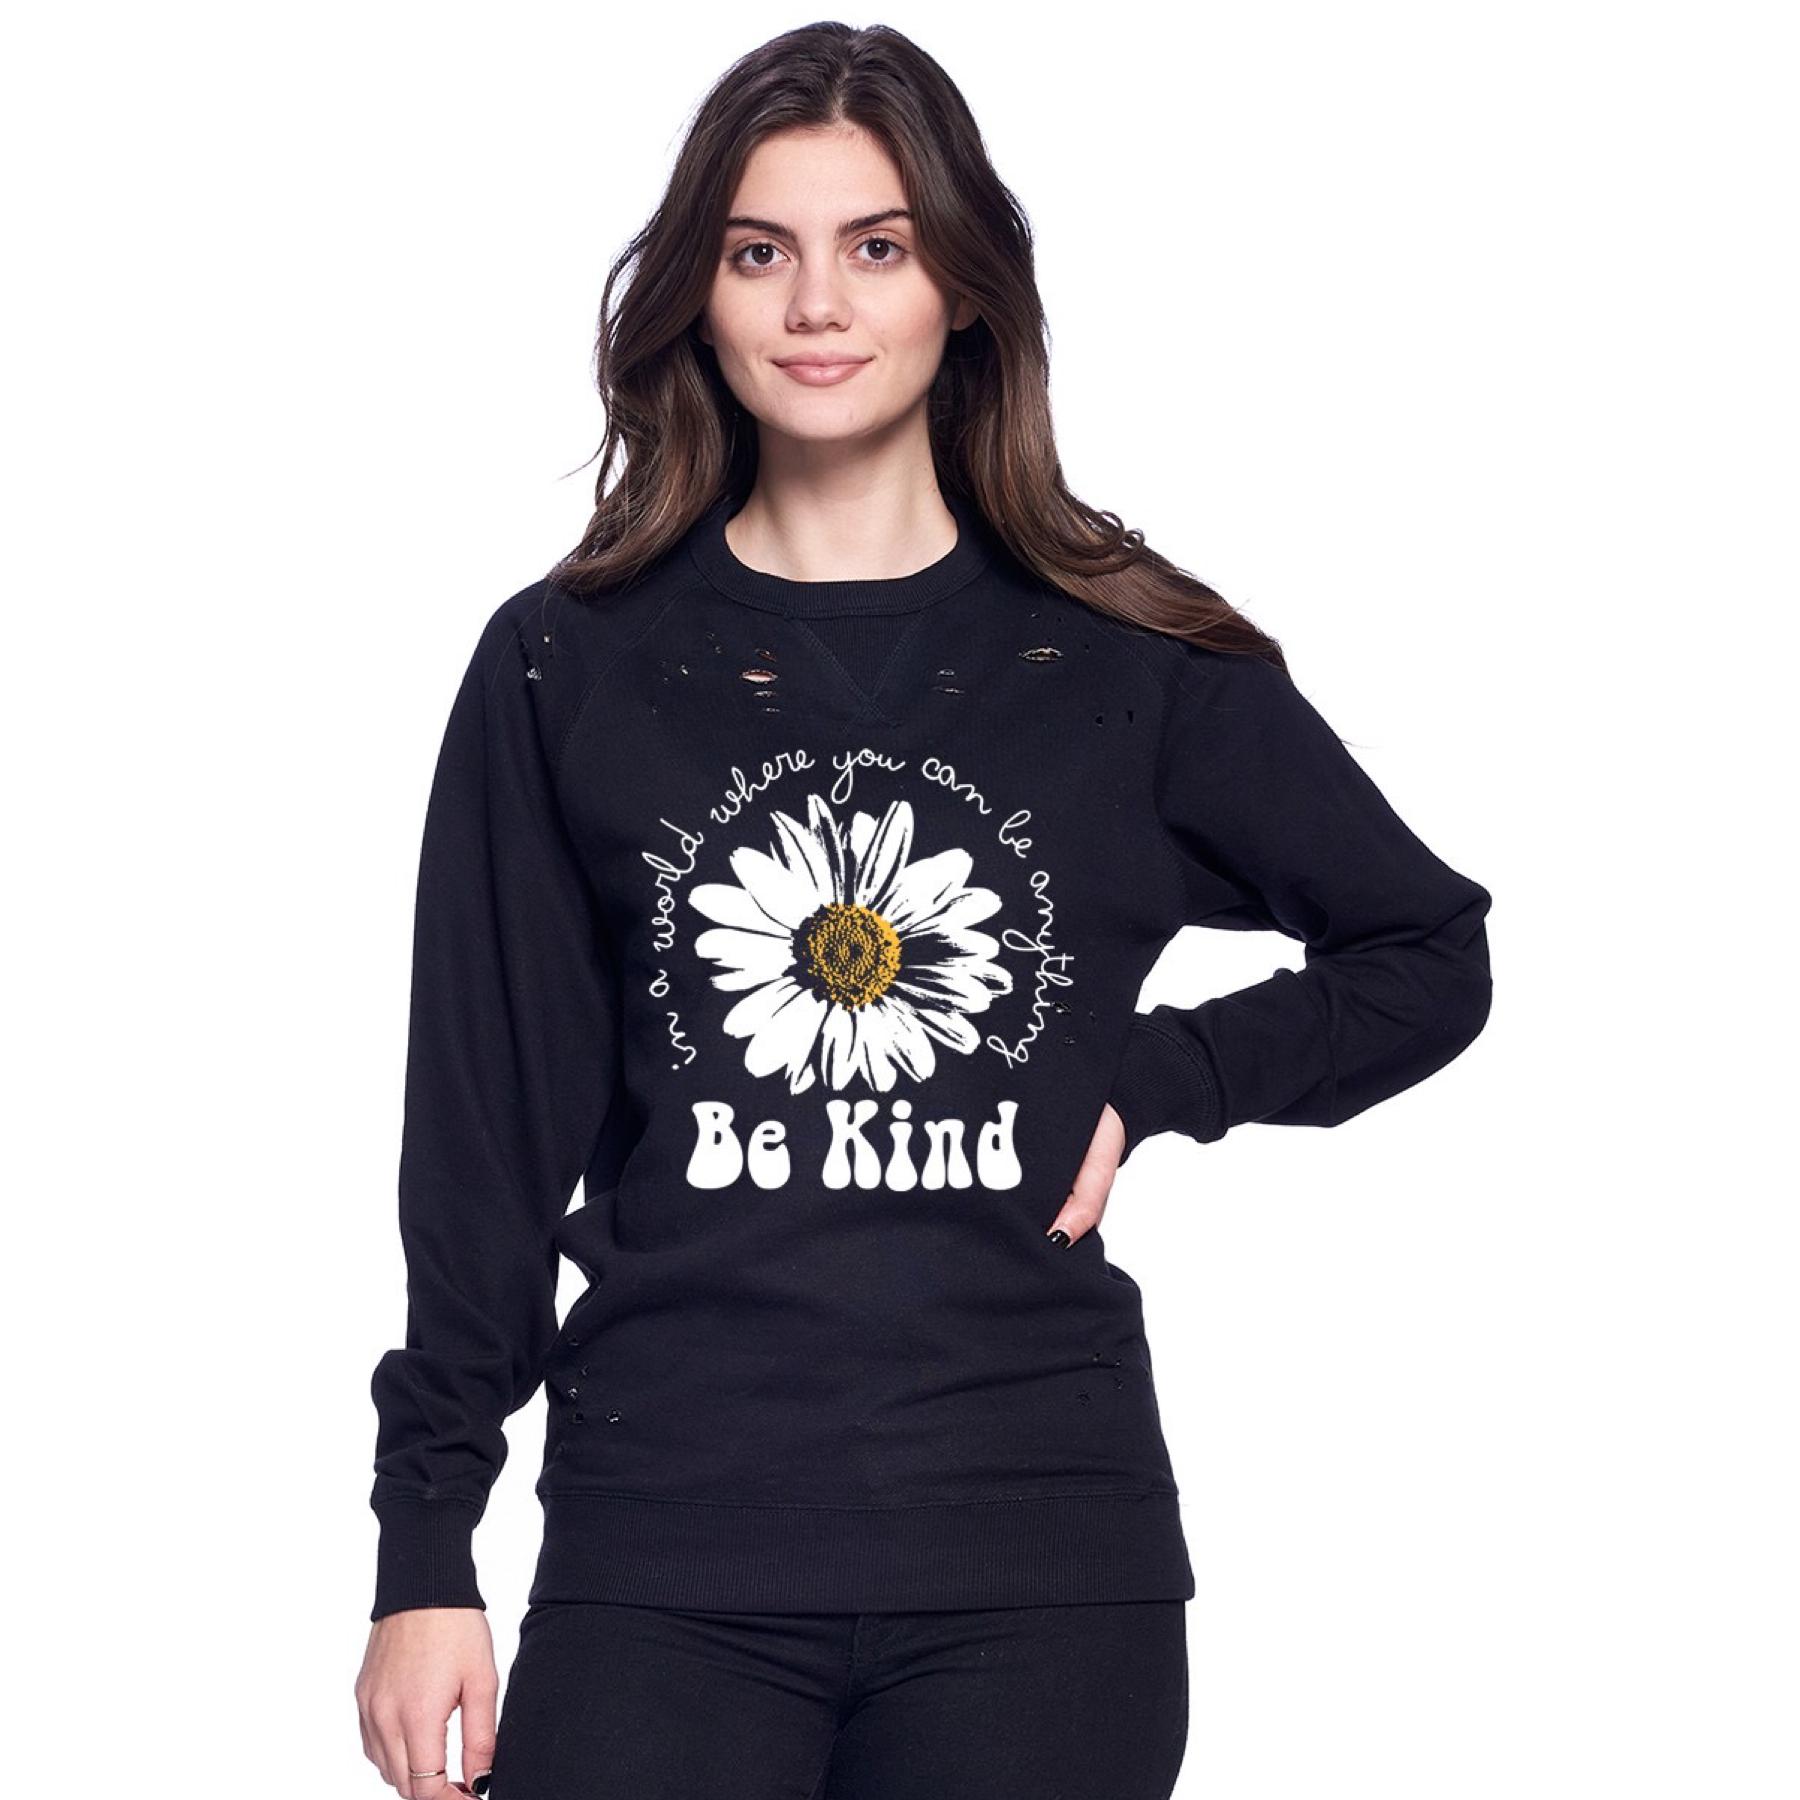 Distressed Be Kind Sweatshirt